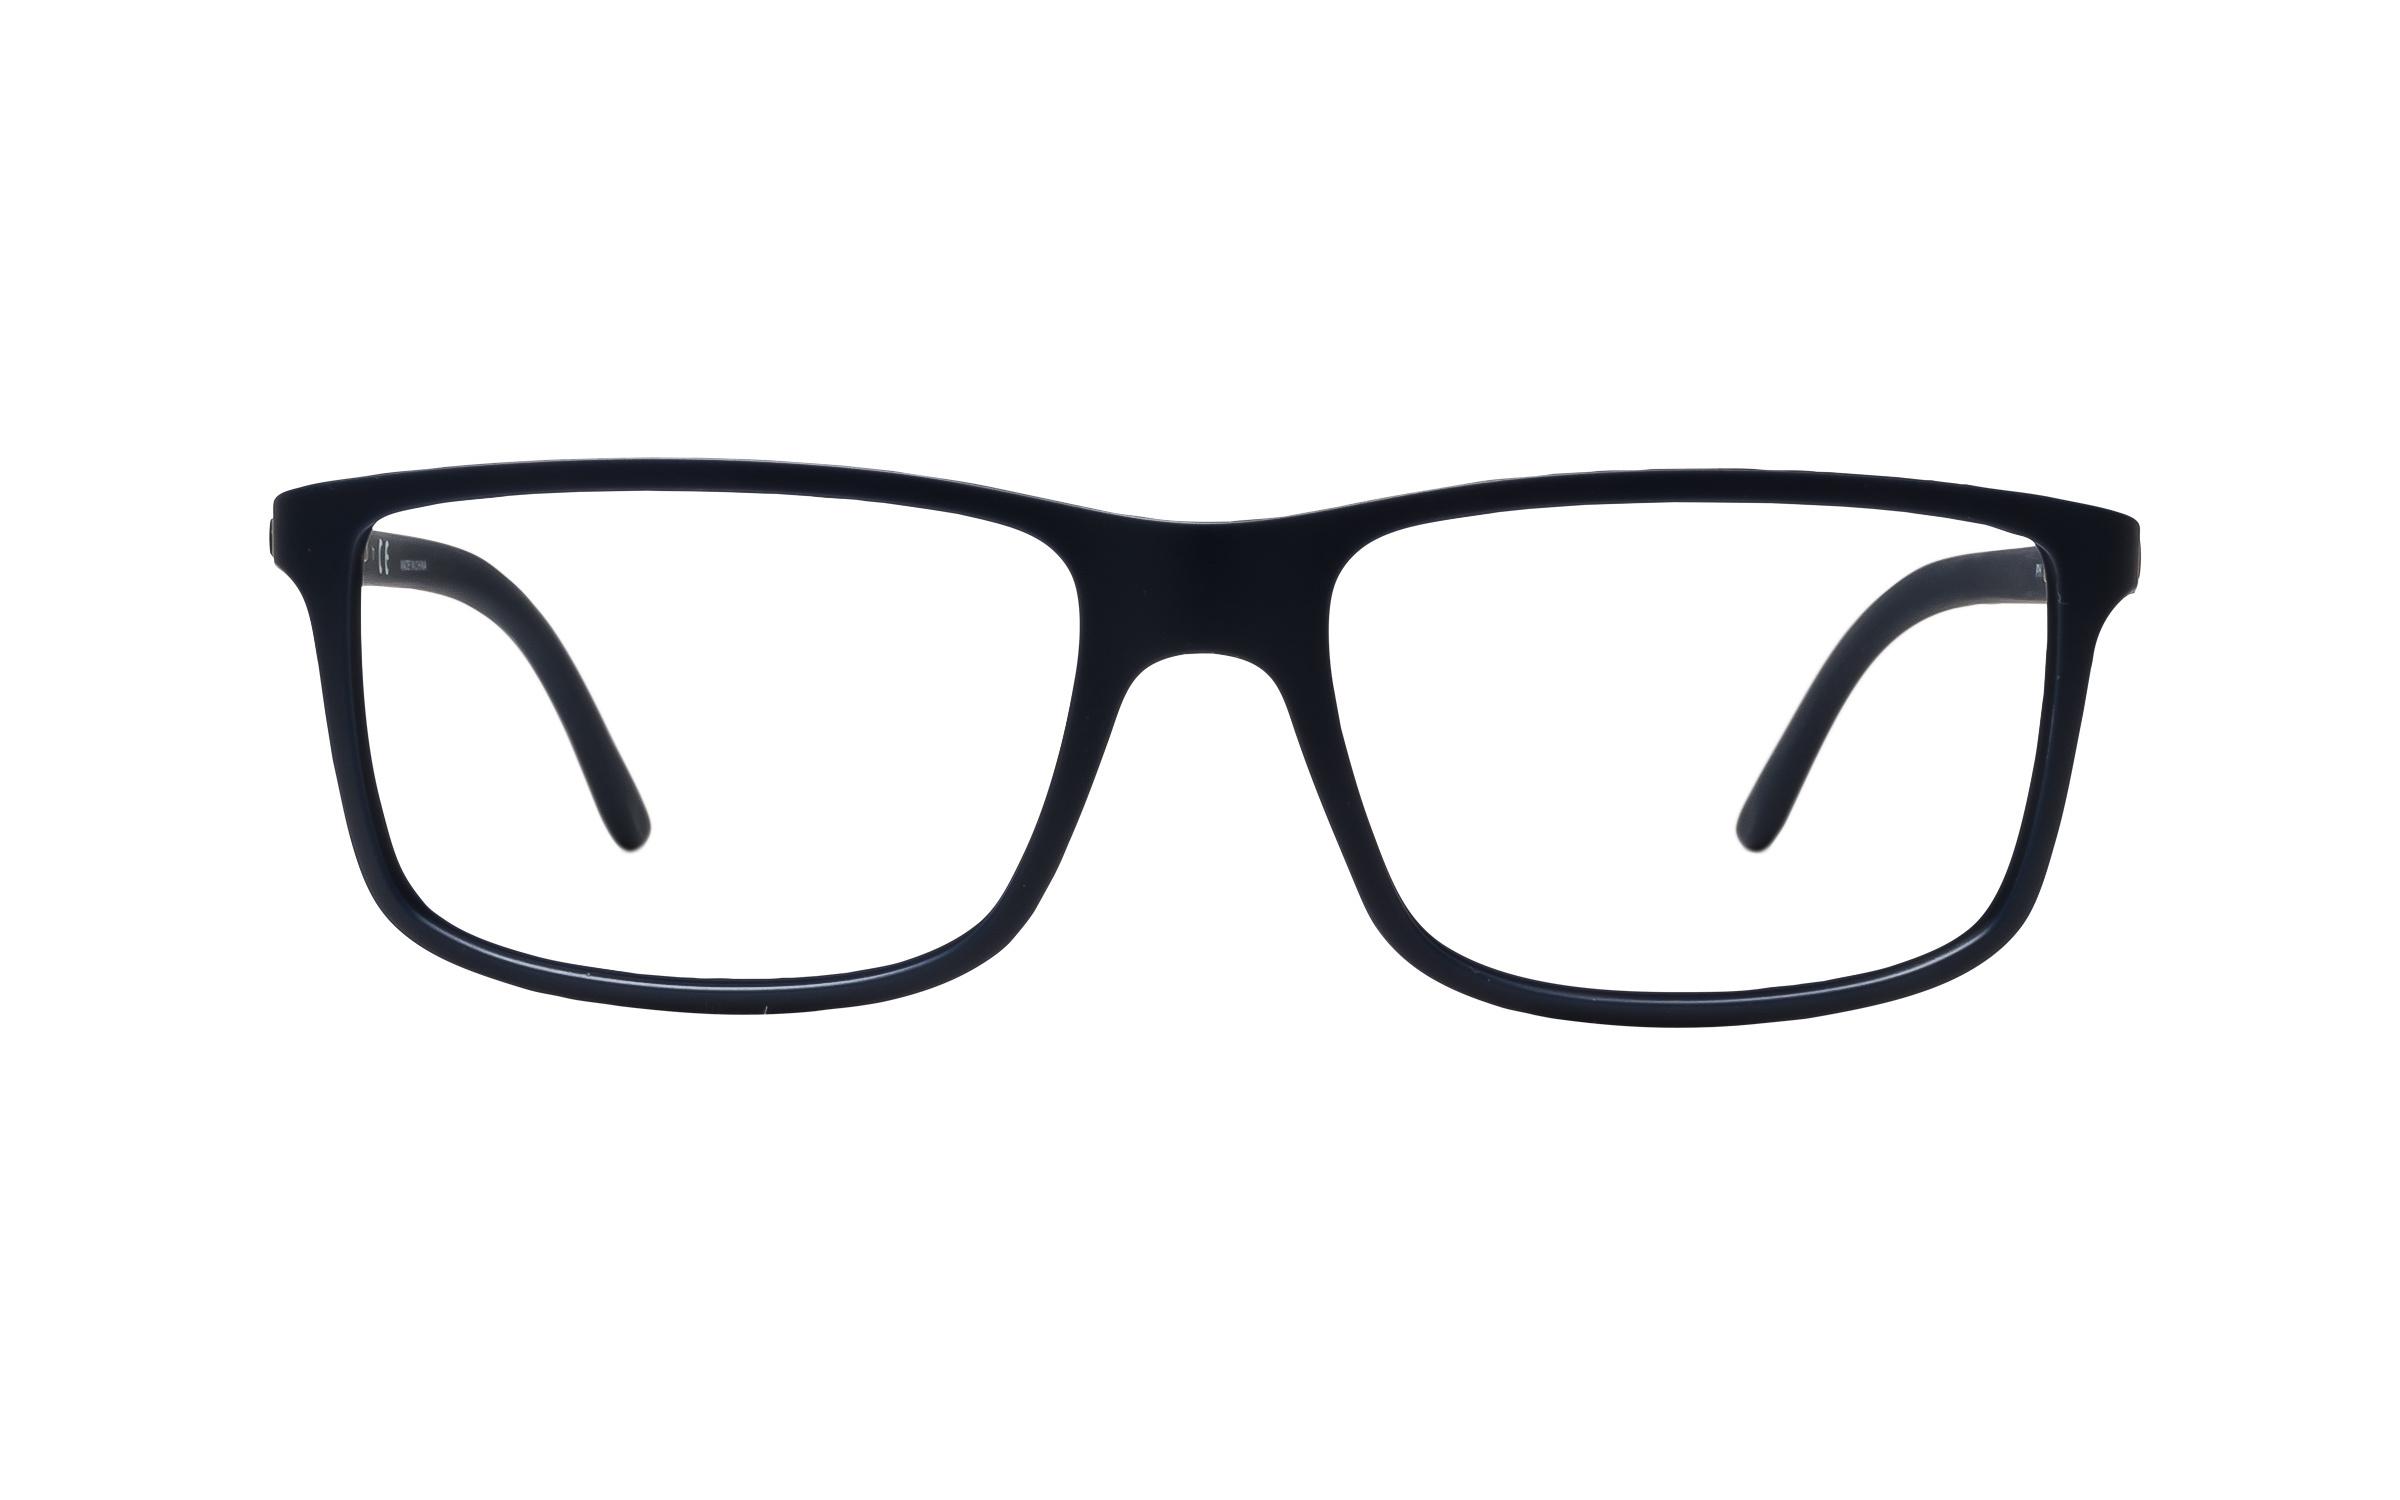 Luxottica Polo Ralph Lauren PH2126 5506 (55) Eyeglasses and Frame in Matte Blue | Acetate - Online Coastal